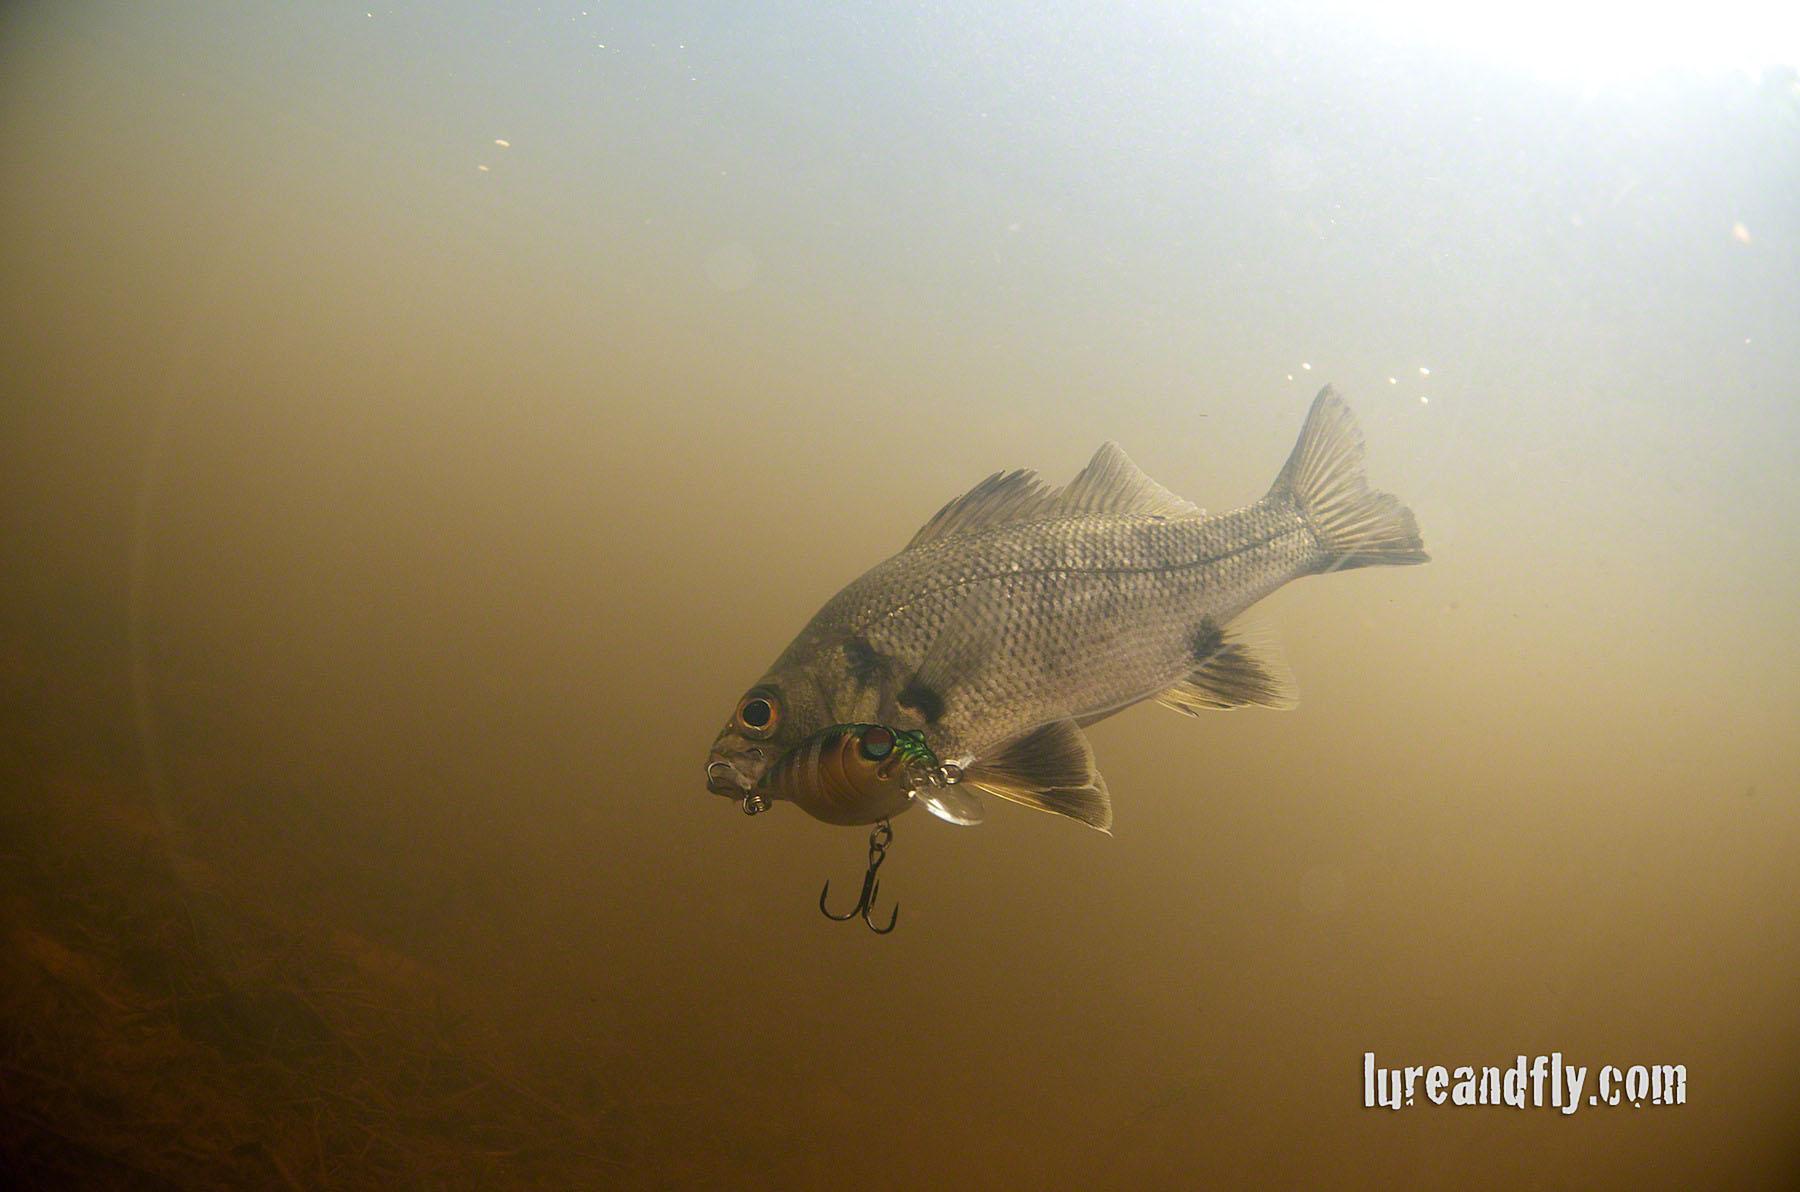 Bass Fishing Wallpaper Coolendel bass fishing 012jpg 1800x1192